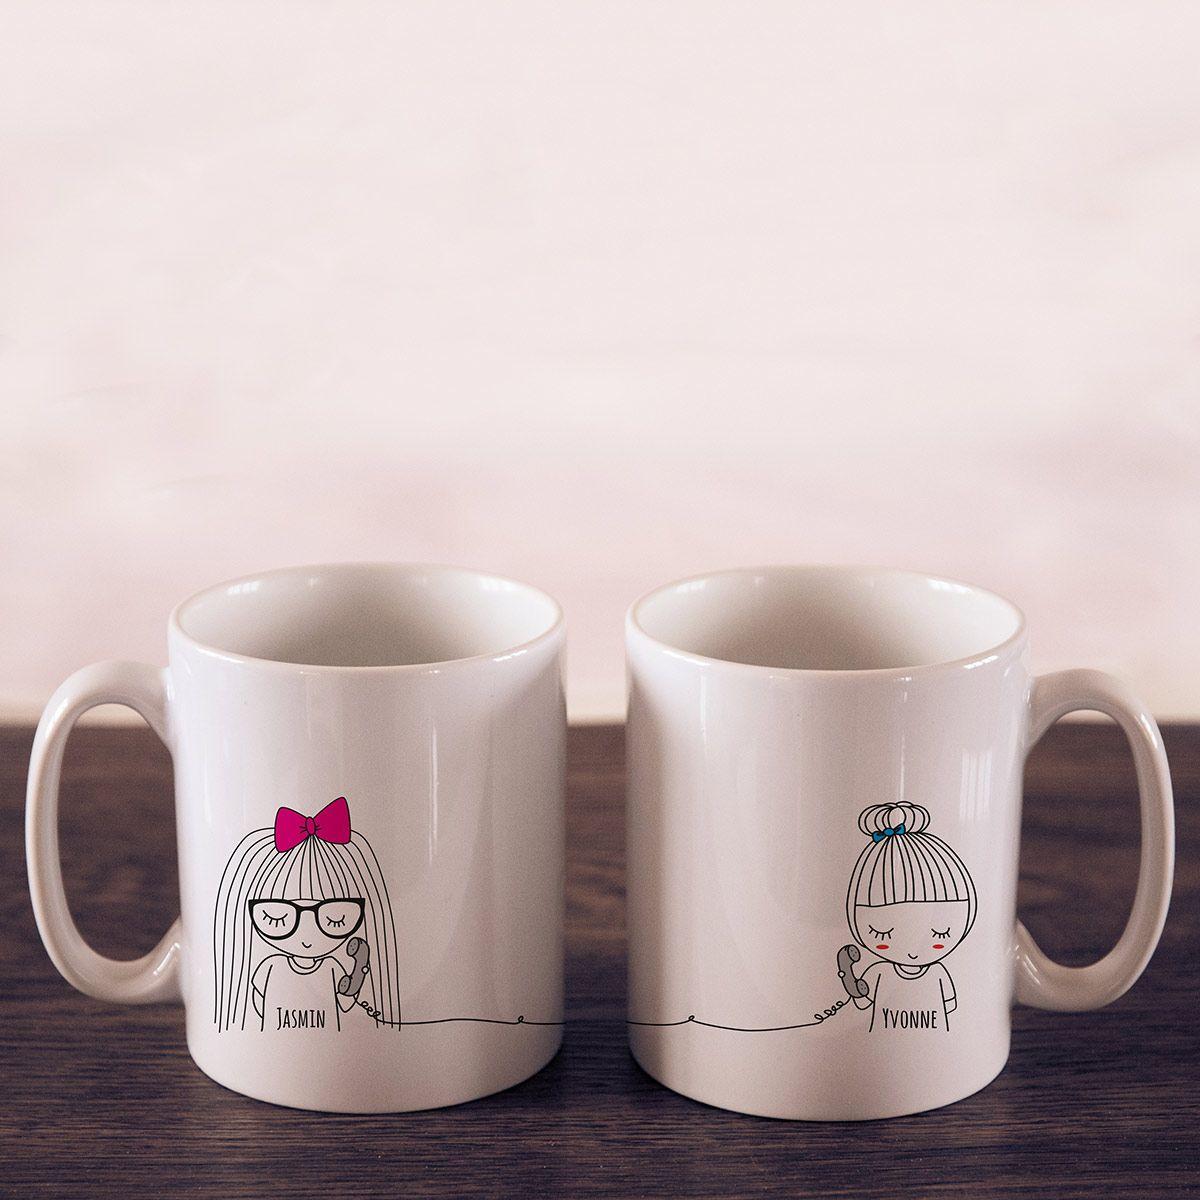 729ba1c9fe0 Personello Exklusive Personalisierbare Tasse - Long Distance links online  kaufen ➜ Bestellen Sie Exklusive Personalisierbare Tasse